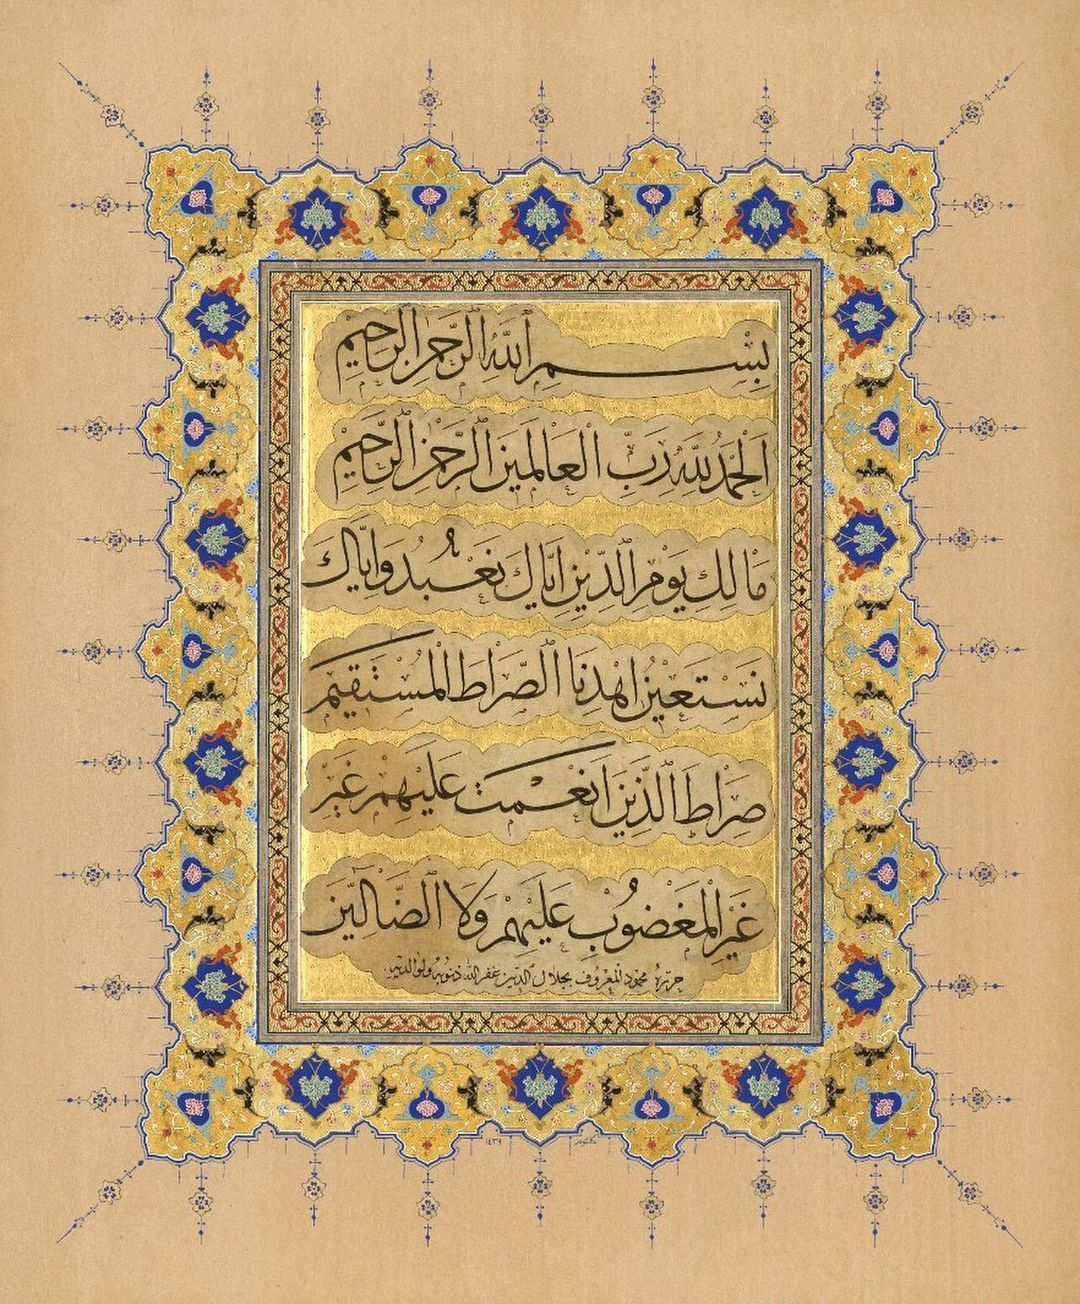 Apk Website For Arabic Calligraphy بِسْمِ اللّٰهِ الرَّحْمٰنِ الرَّح۪يمِ اَلْحَمْدُ لِلّٰهِ رَبِّ الْـعَالَم۪ينَۙ ا… 1441